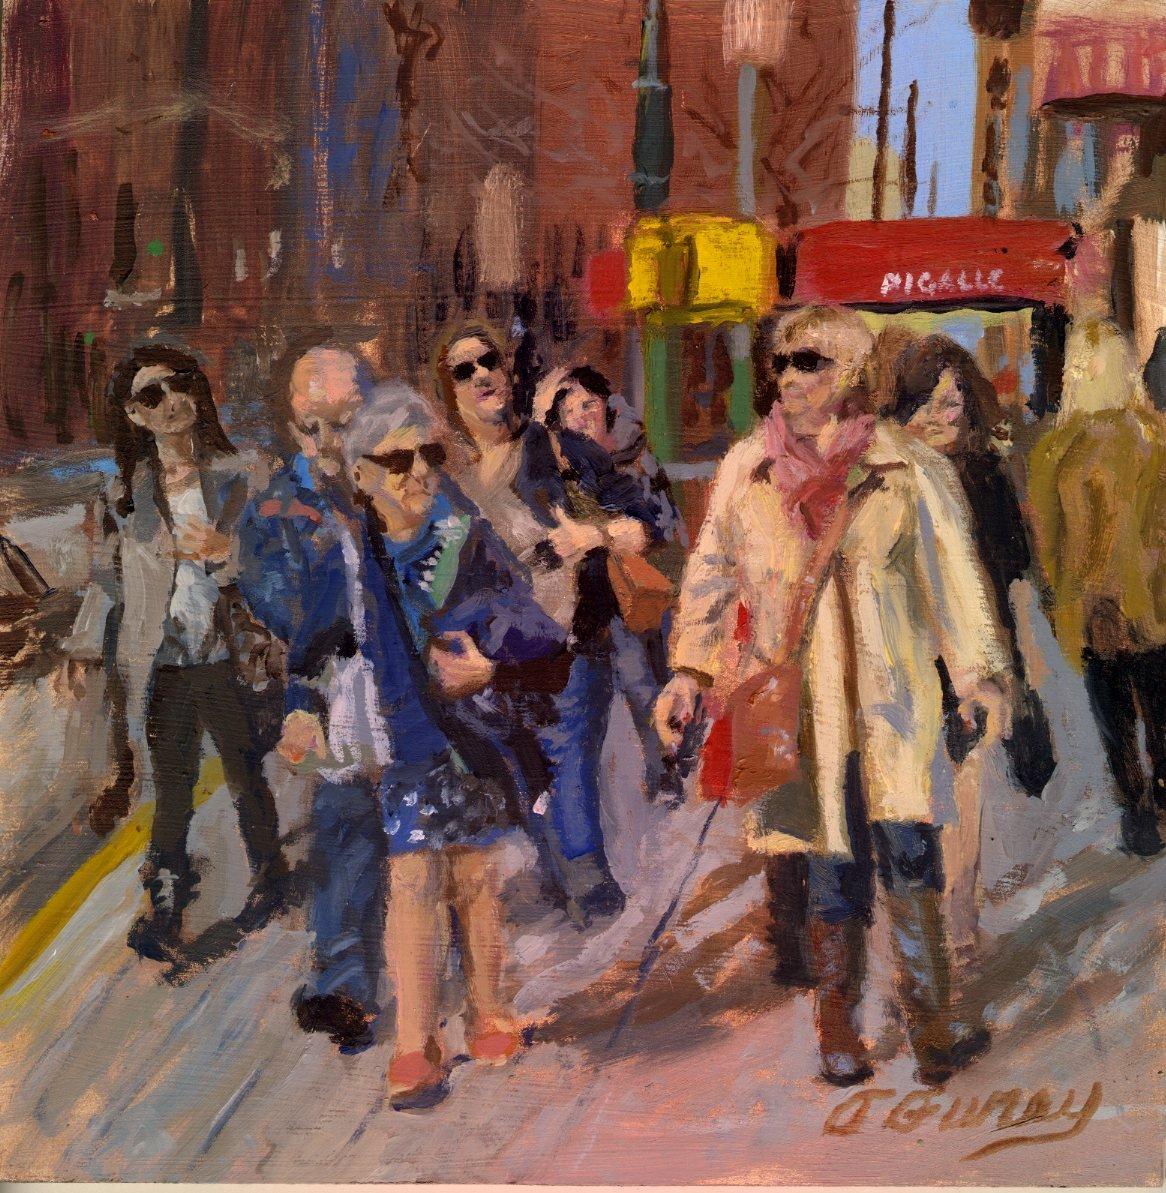 "City Challenge, Alla Prima Oil Painting on Board, 8"" x 8""."